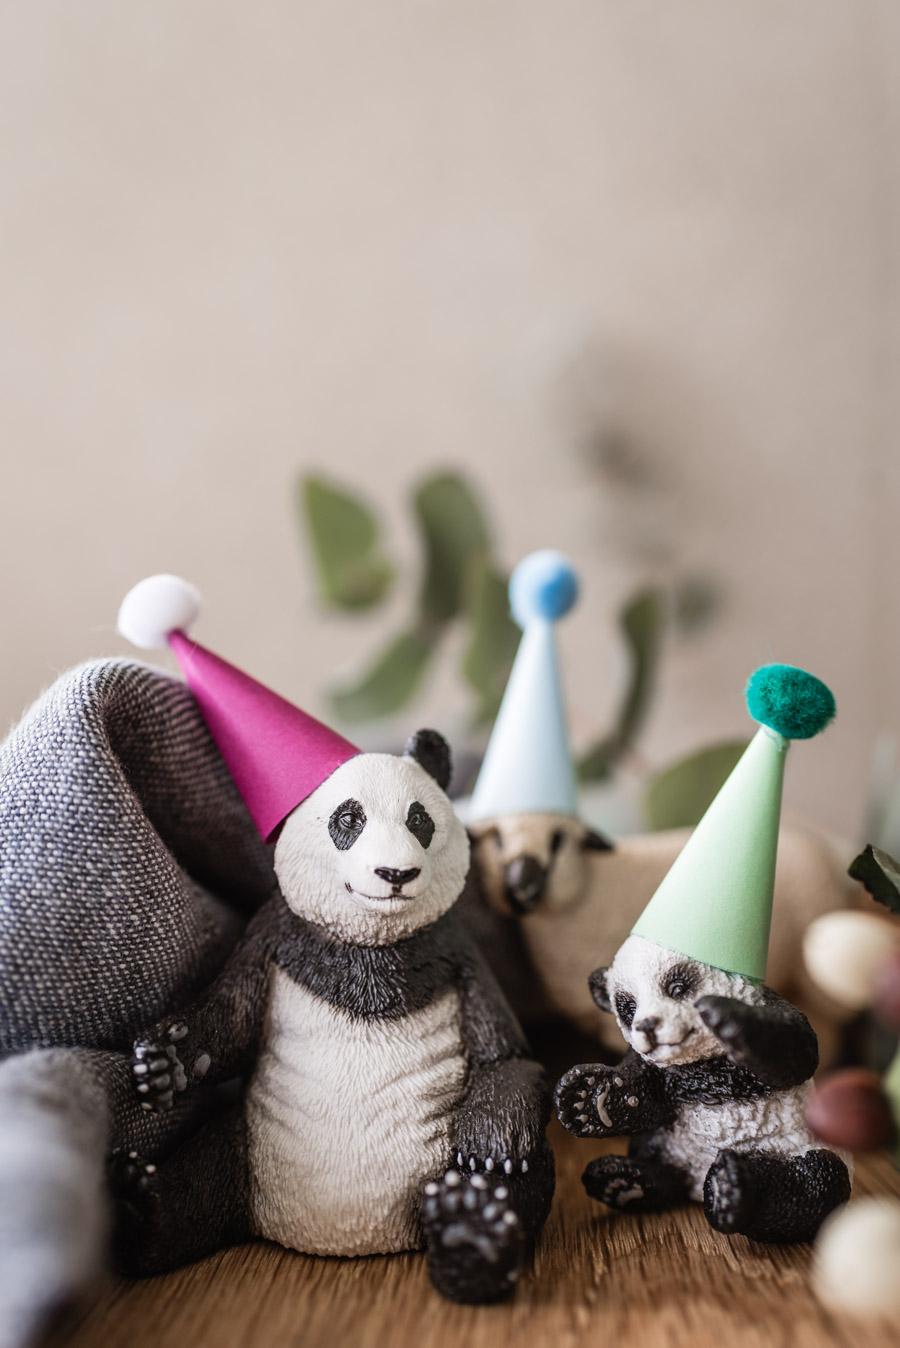 Play and craft ideas with sneaking for children #kinderspiel #bastelnmitkinder #diy #schleichtiere